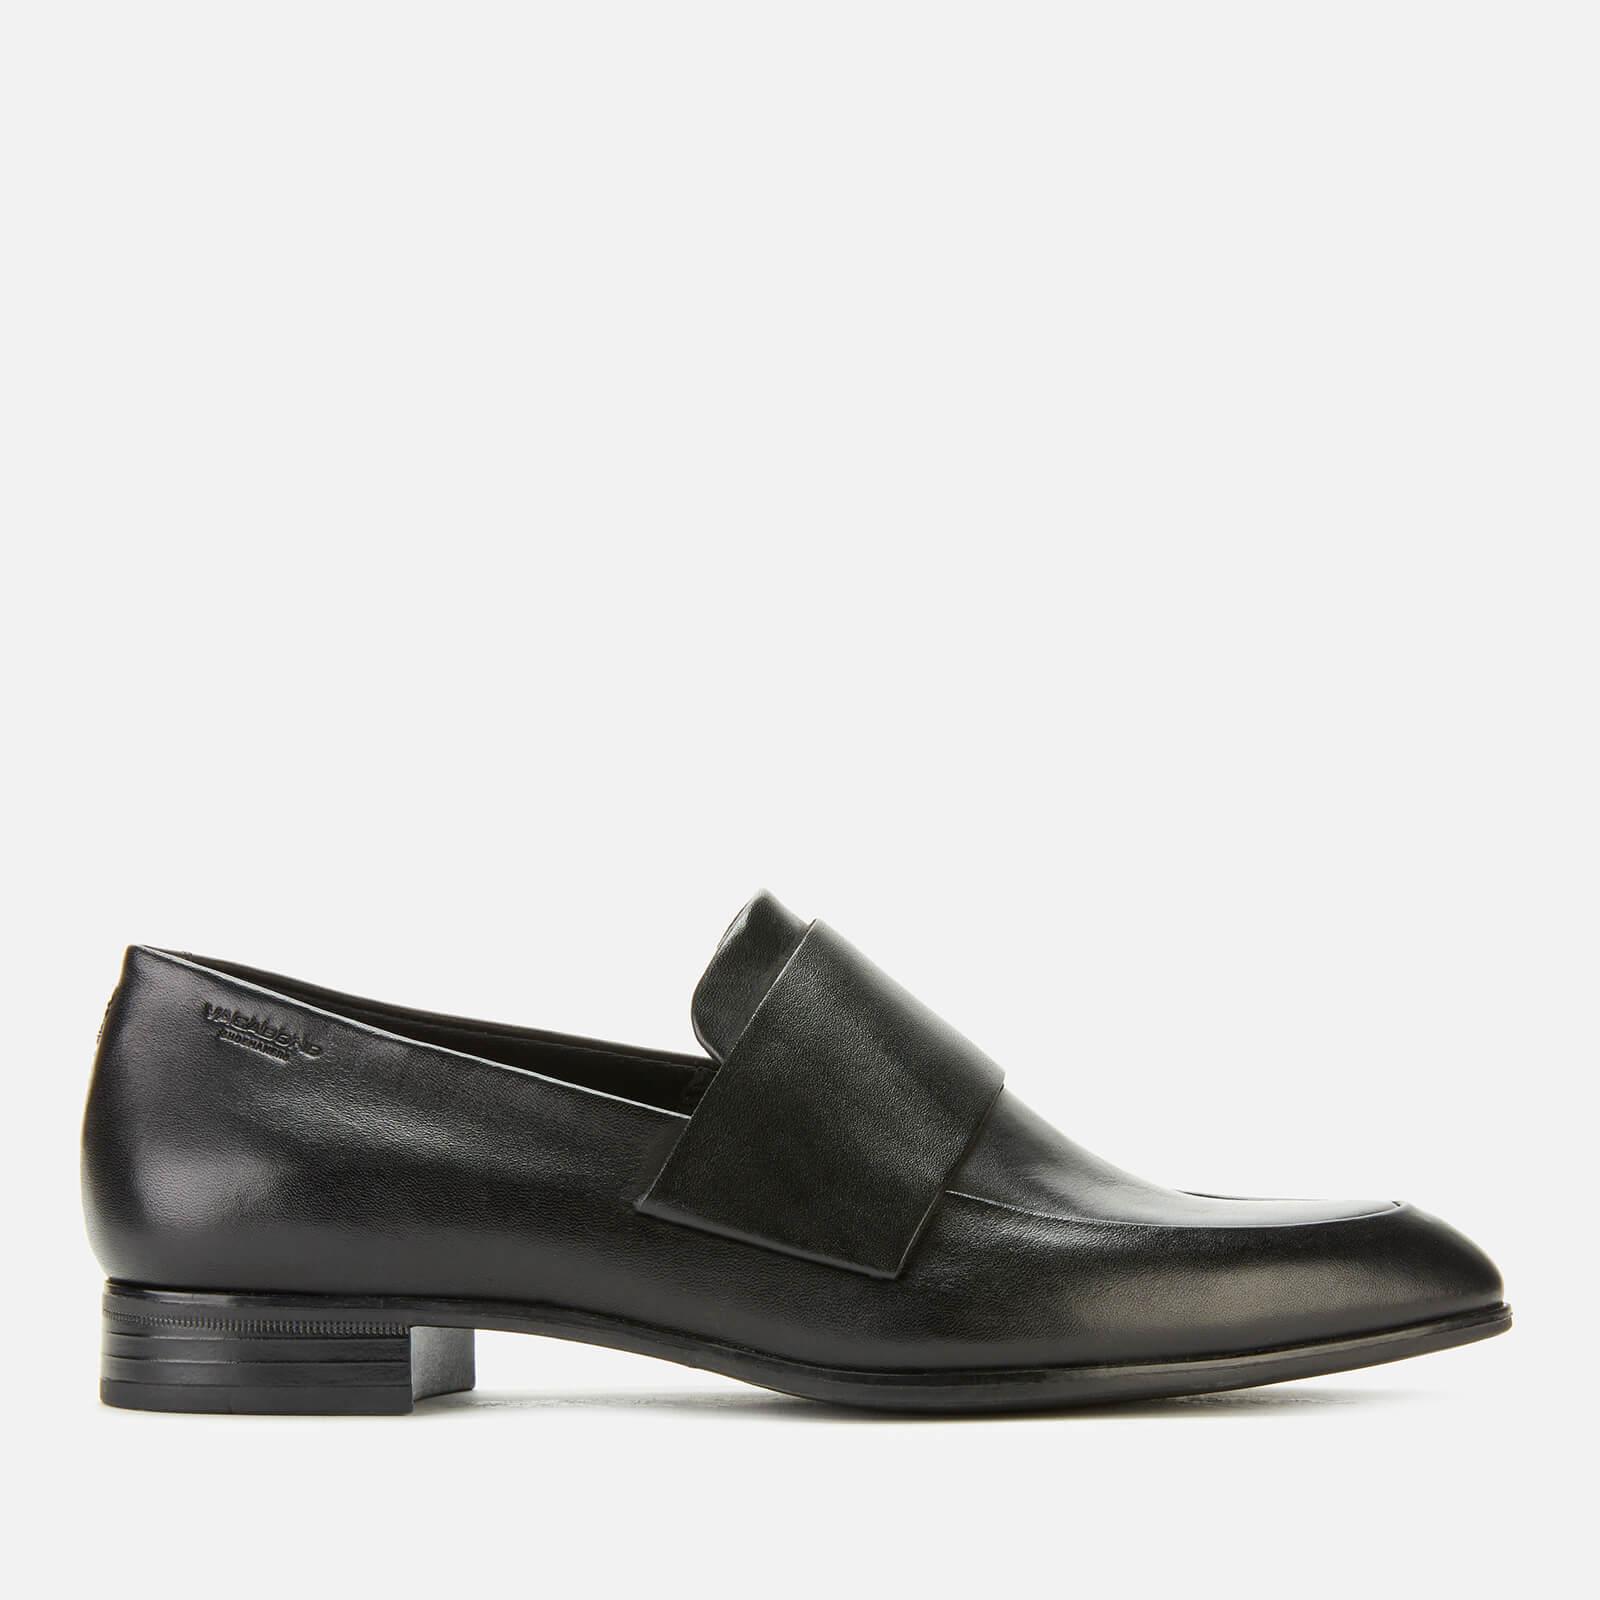 Vagabond Women's Frances Leather Slip-On Shoes - Black - UK 6 - Black